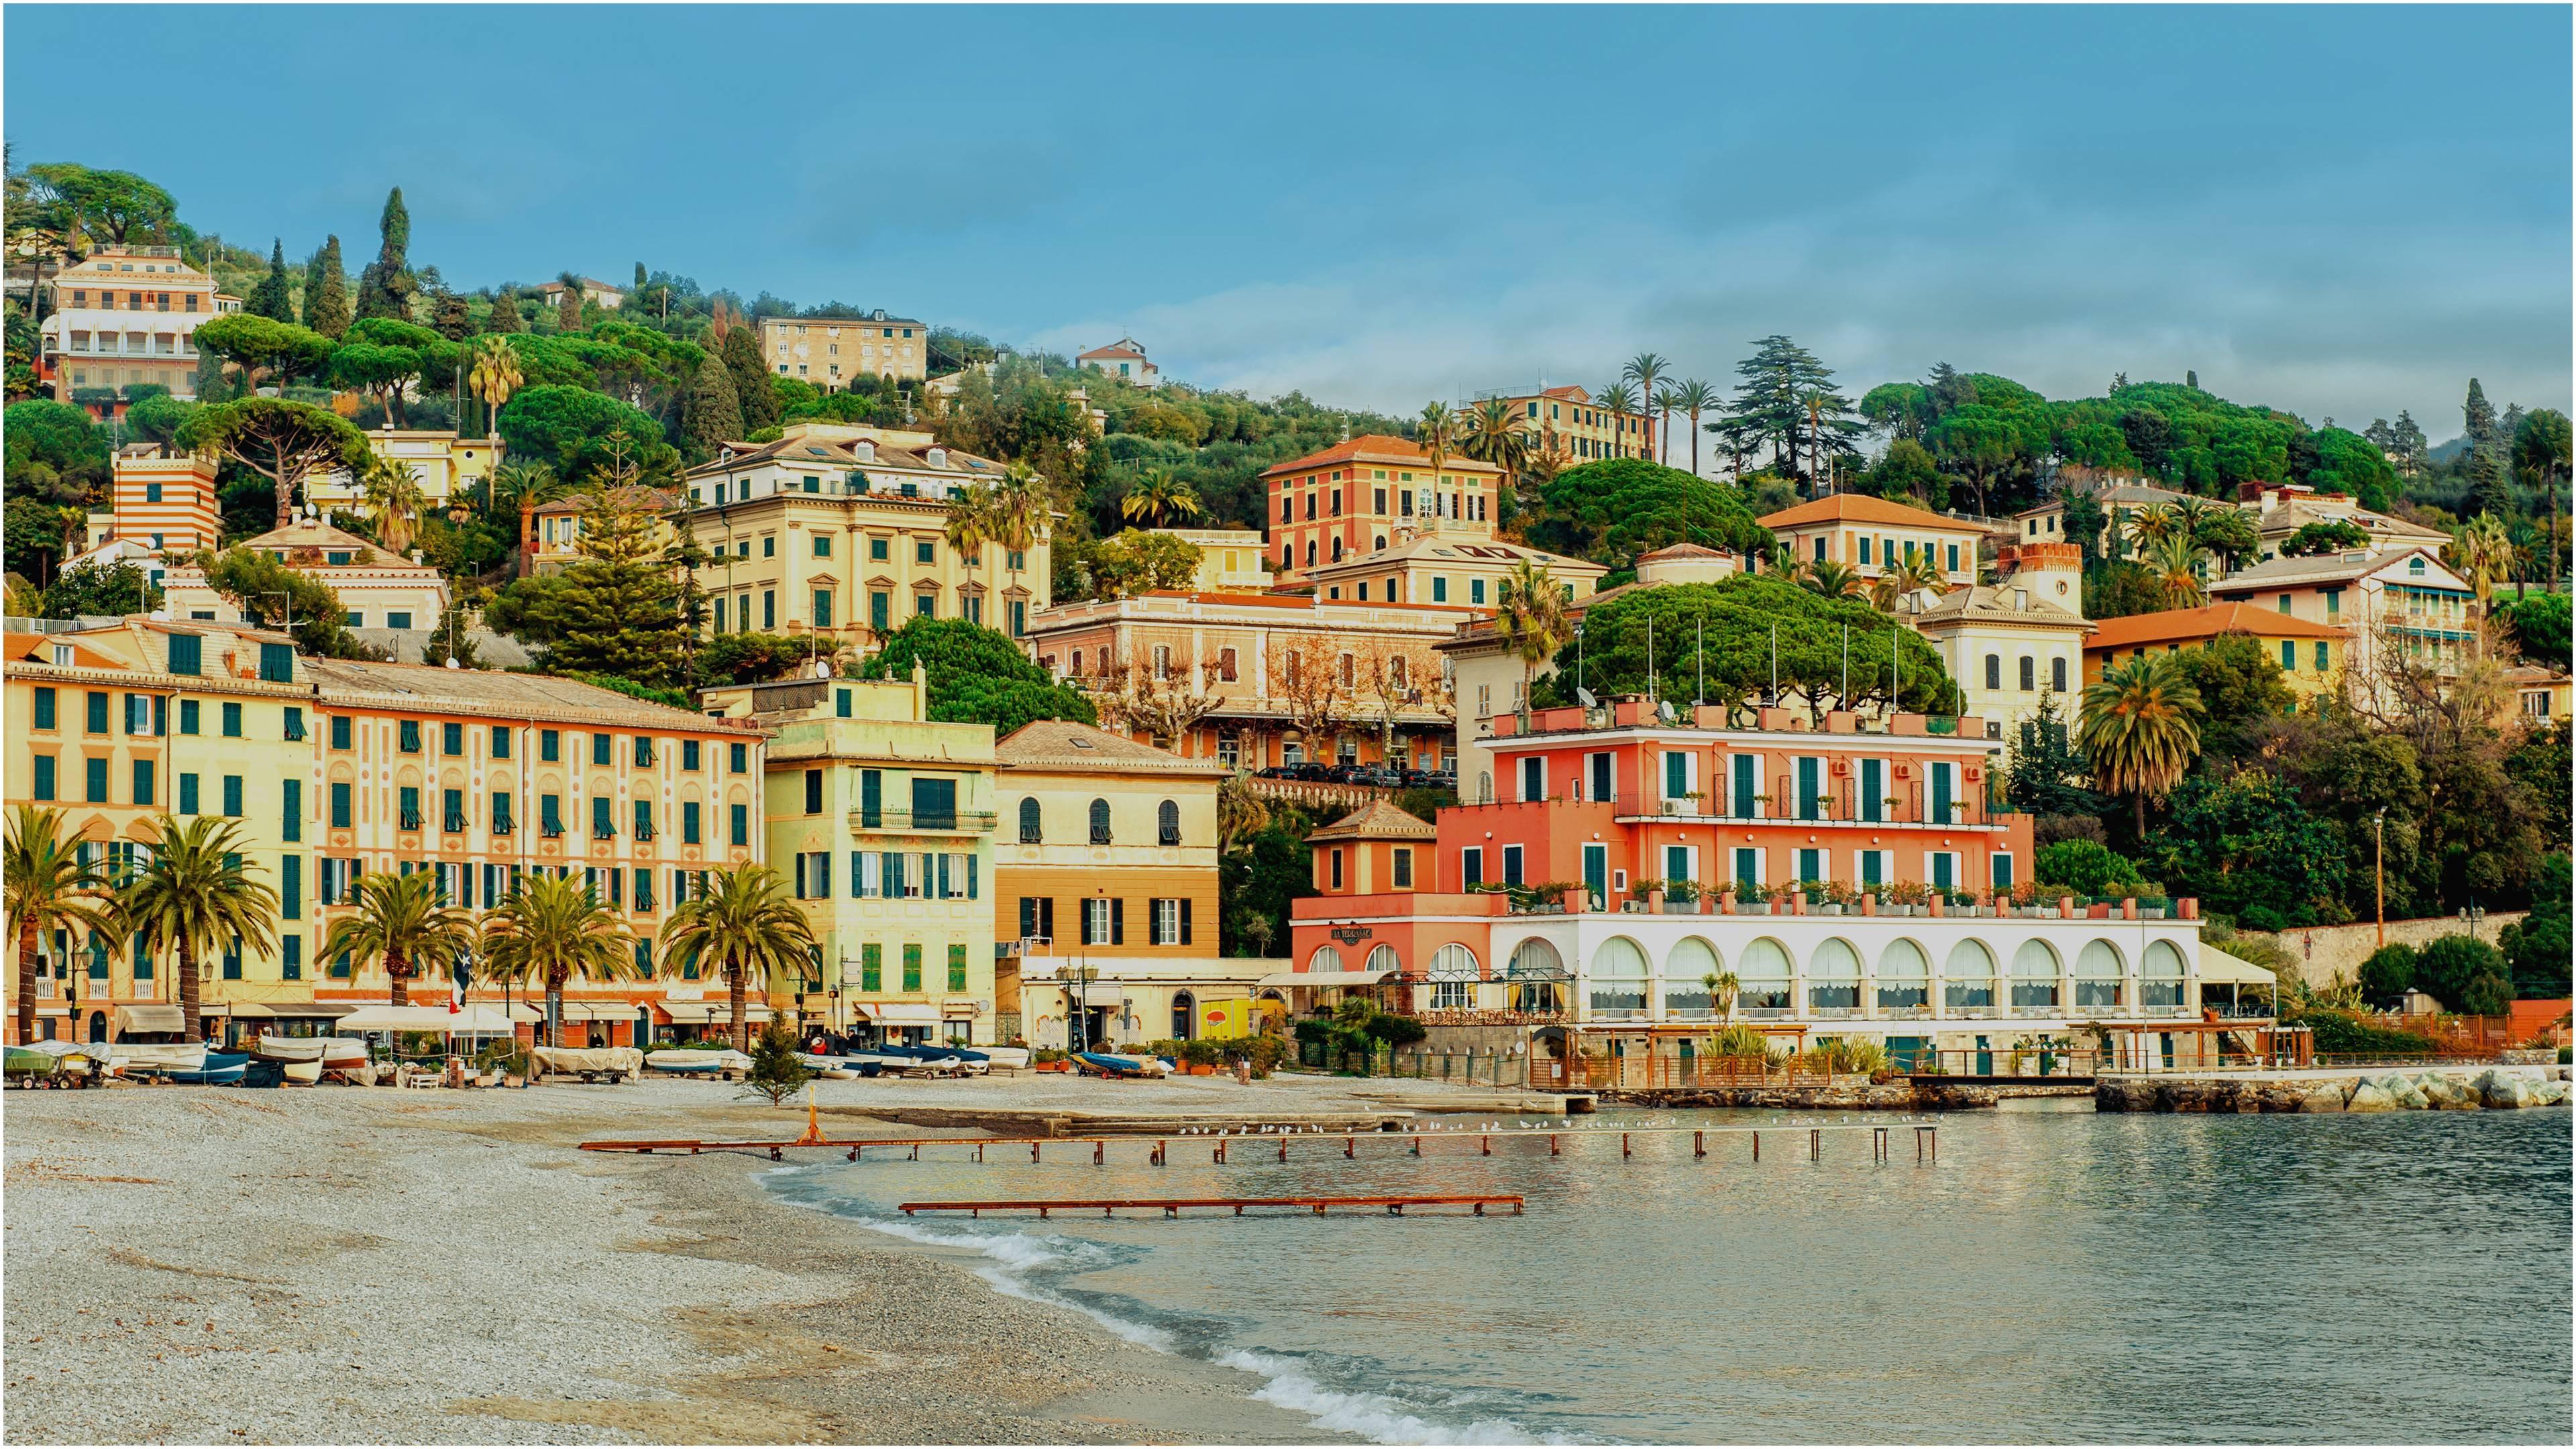 Beach In Santa Margherita Italy Inspirational Cruise to Santa Margherita Italy